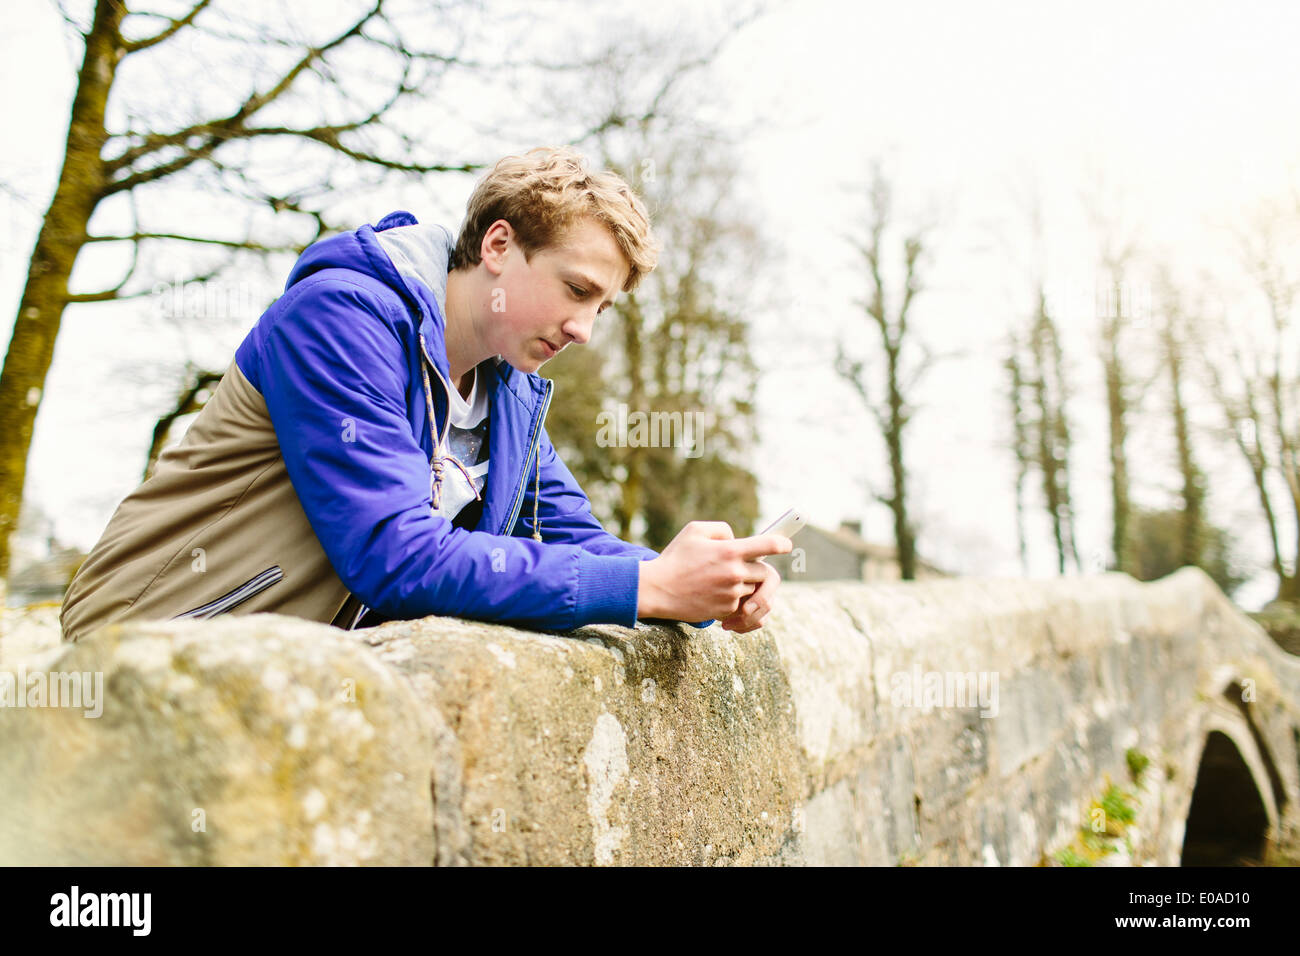 Malheureux teenage boy leaning over rural bridge Photo Stock